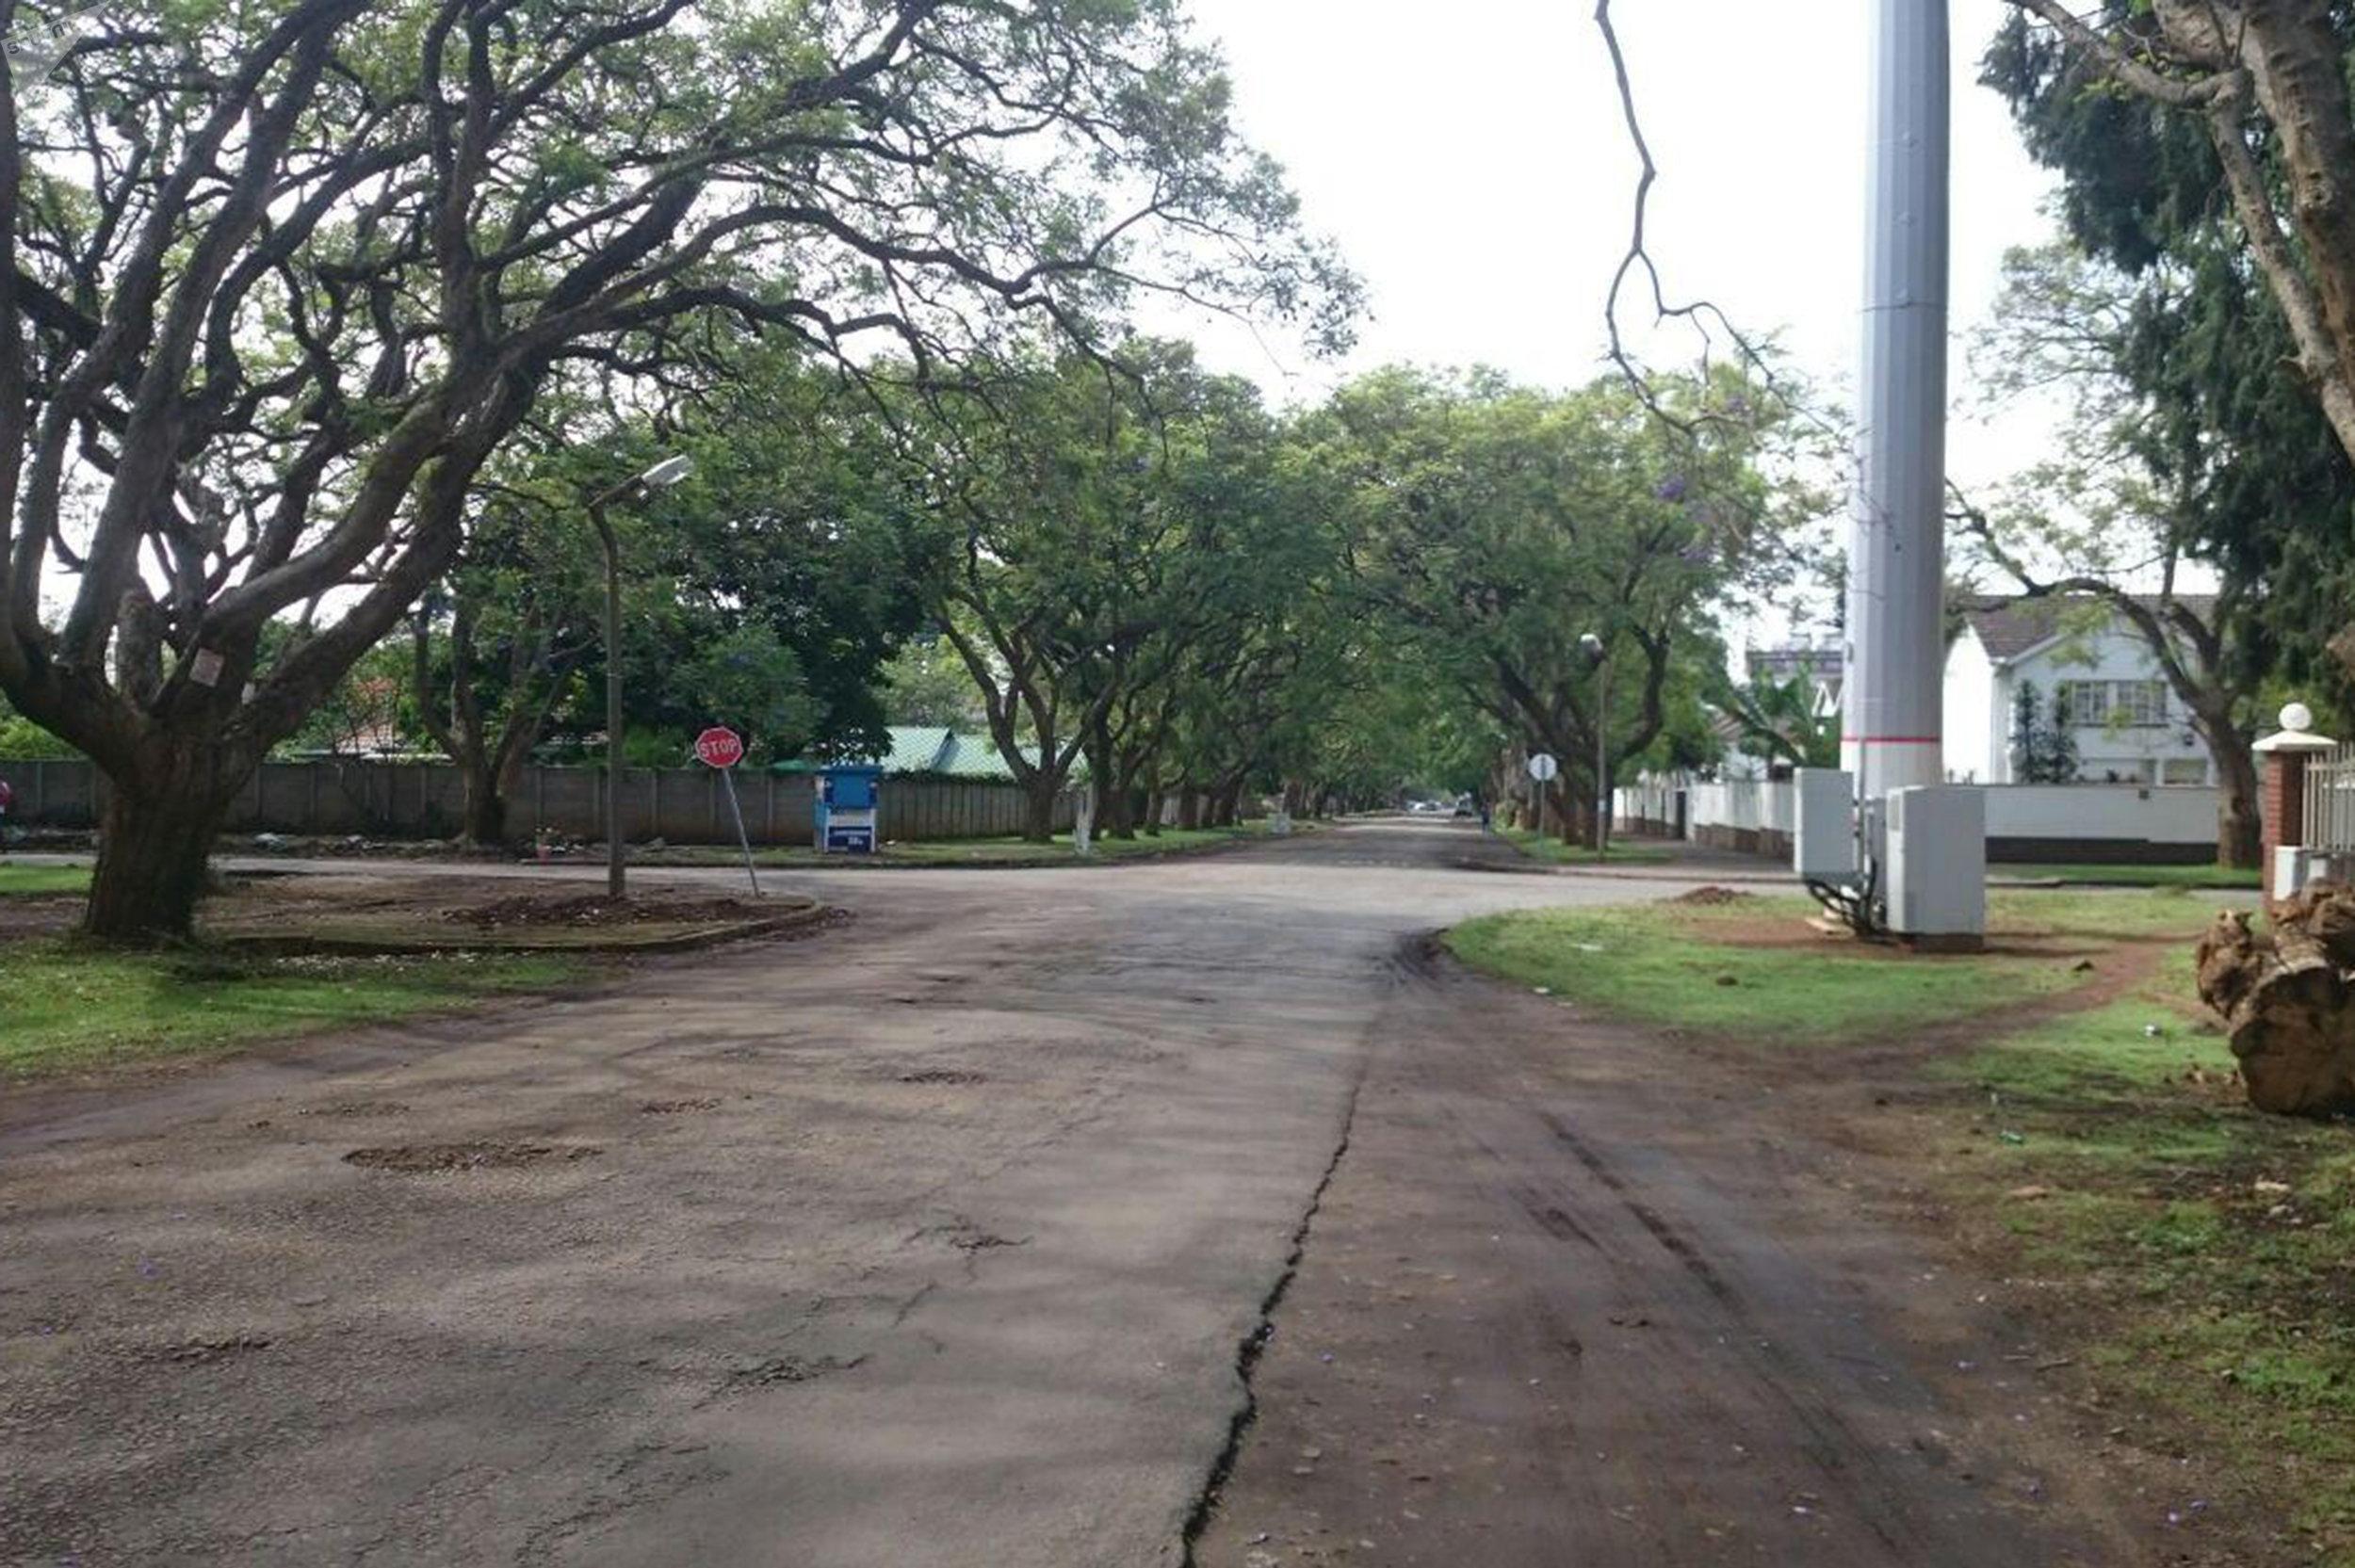 Les rues de Harare après le coup d'État